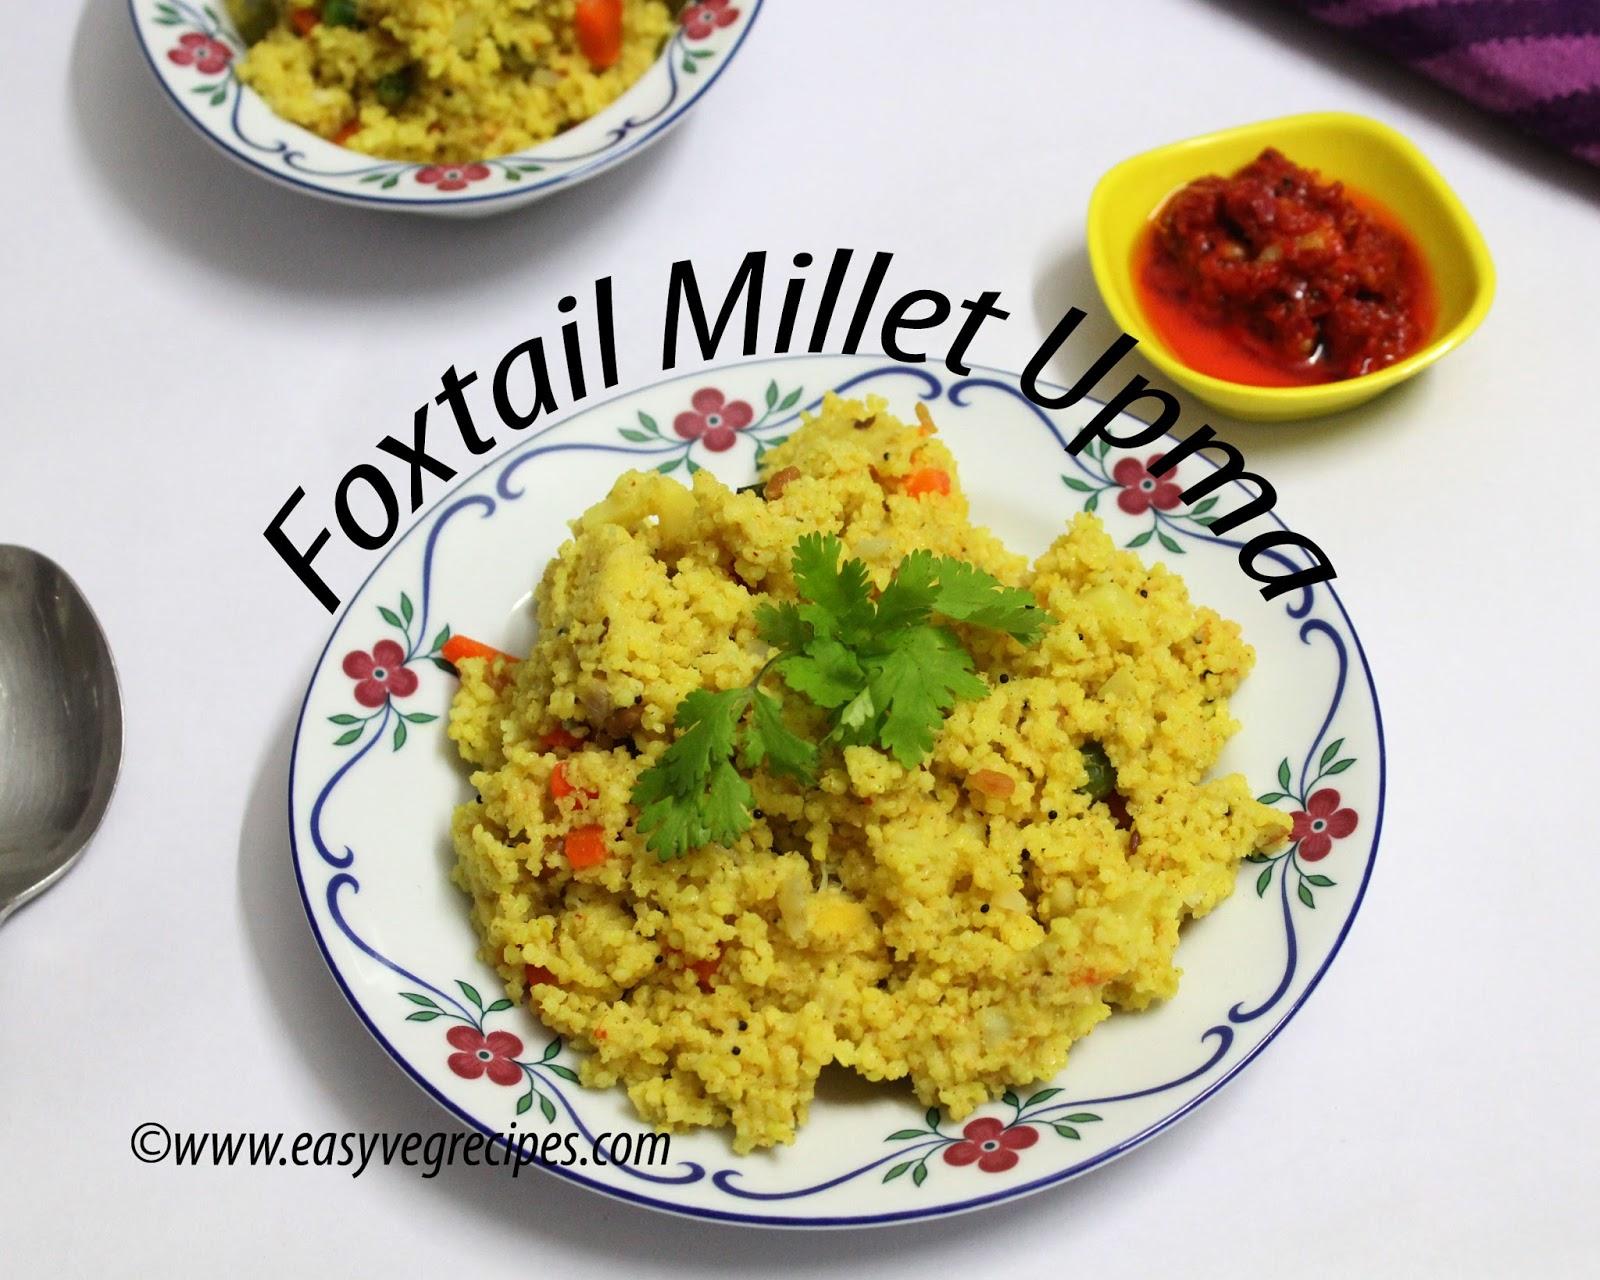 Foxtail Millet Upma